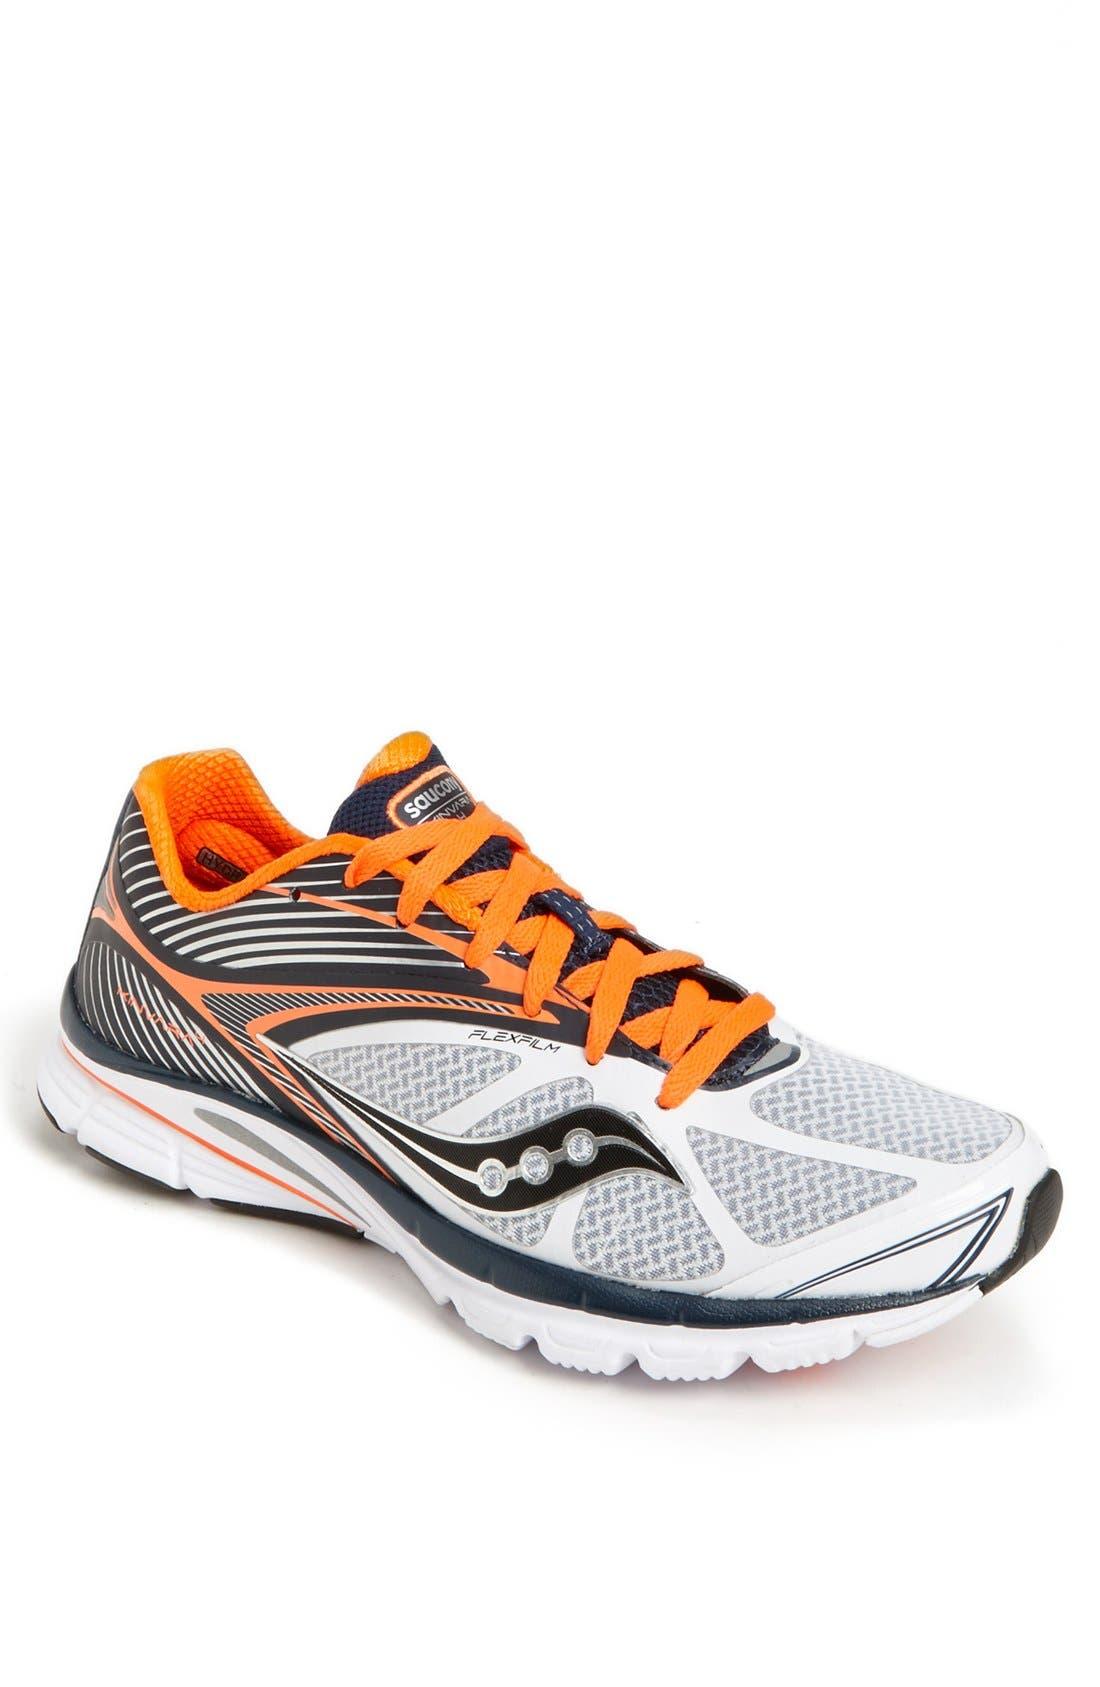 Alternate Image 1 Selected - Saucony 'Kinvara 4' Running Shoe (Men)